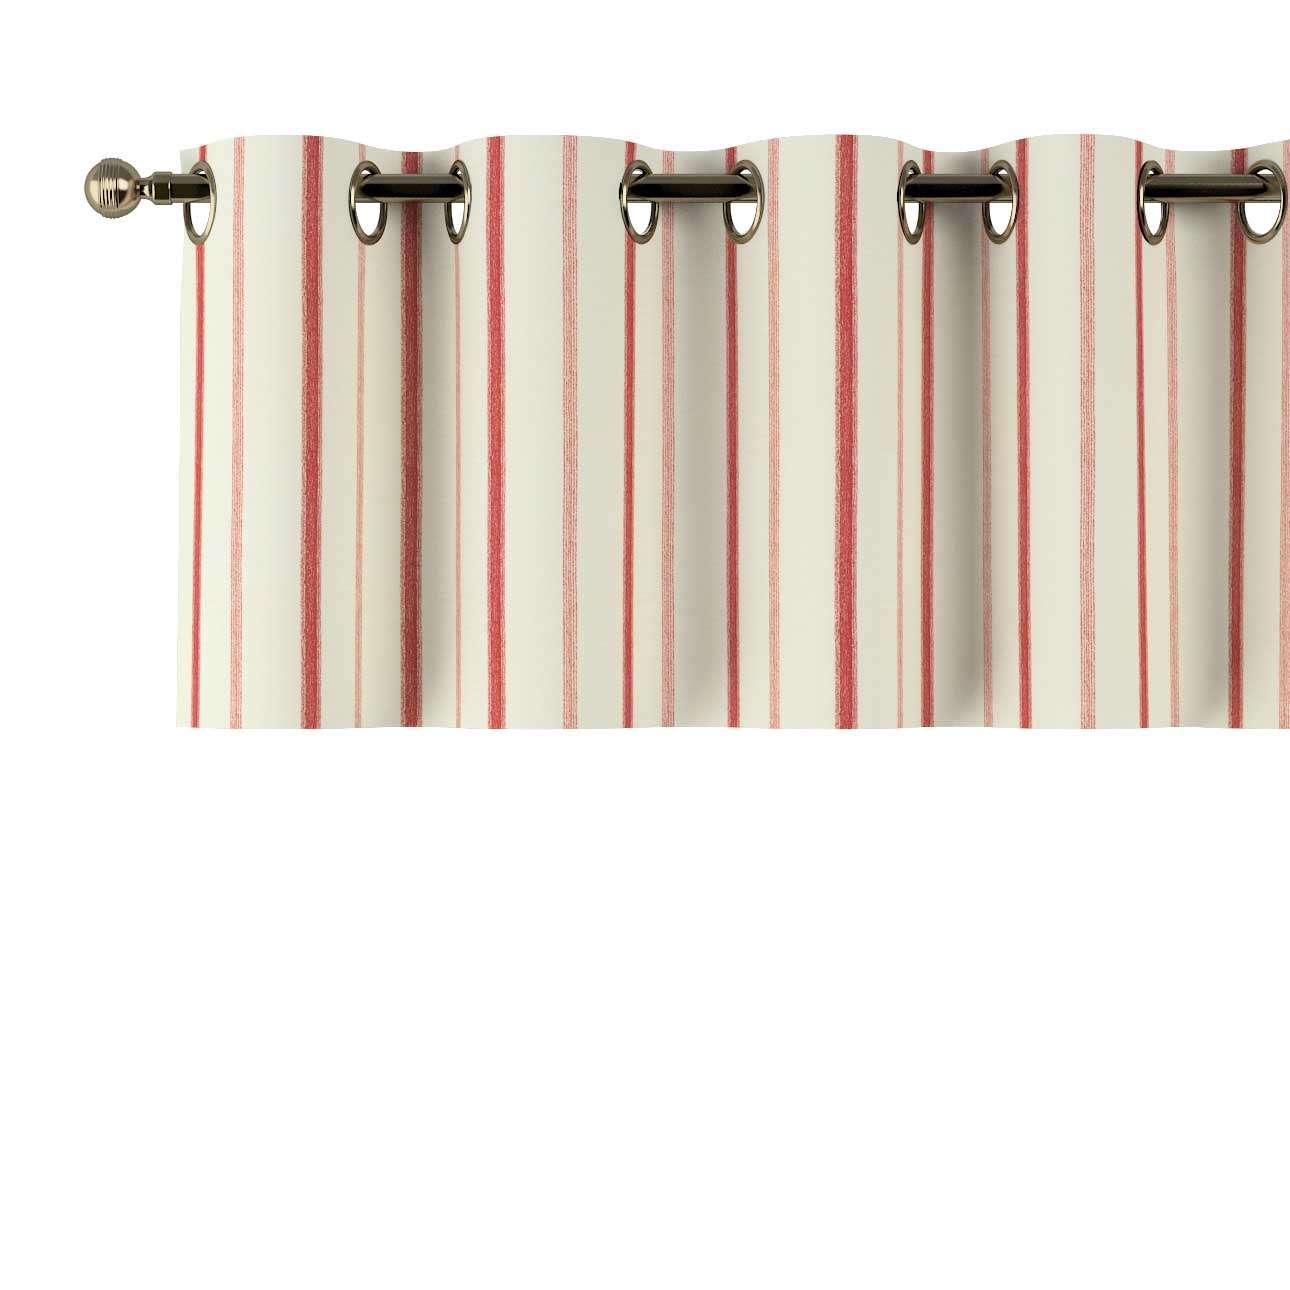 Kurzgardine mit Ösen von der Kollektion Avinon, Stoff: 129-15